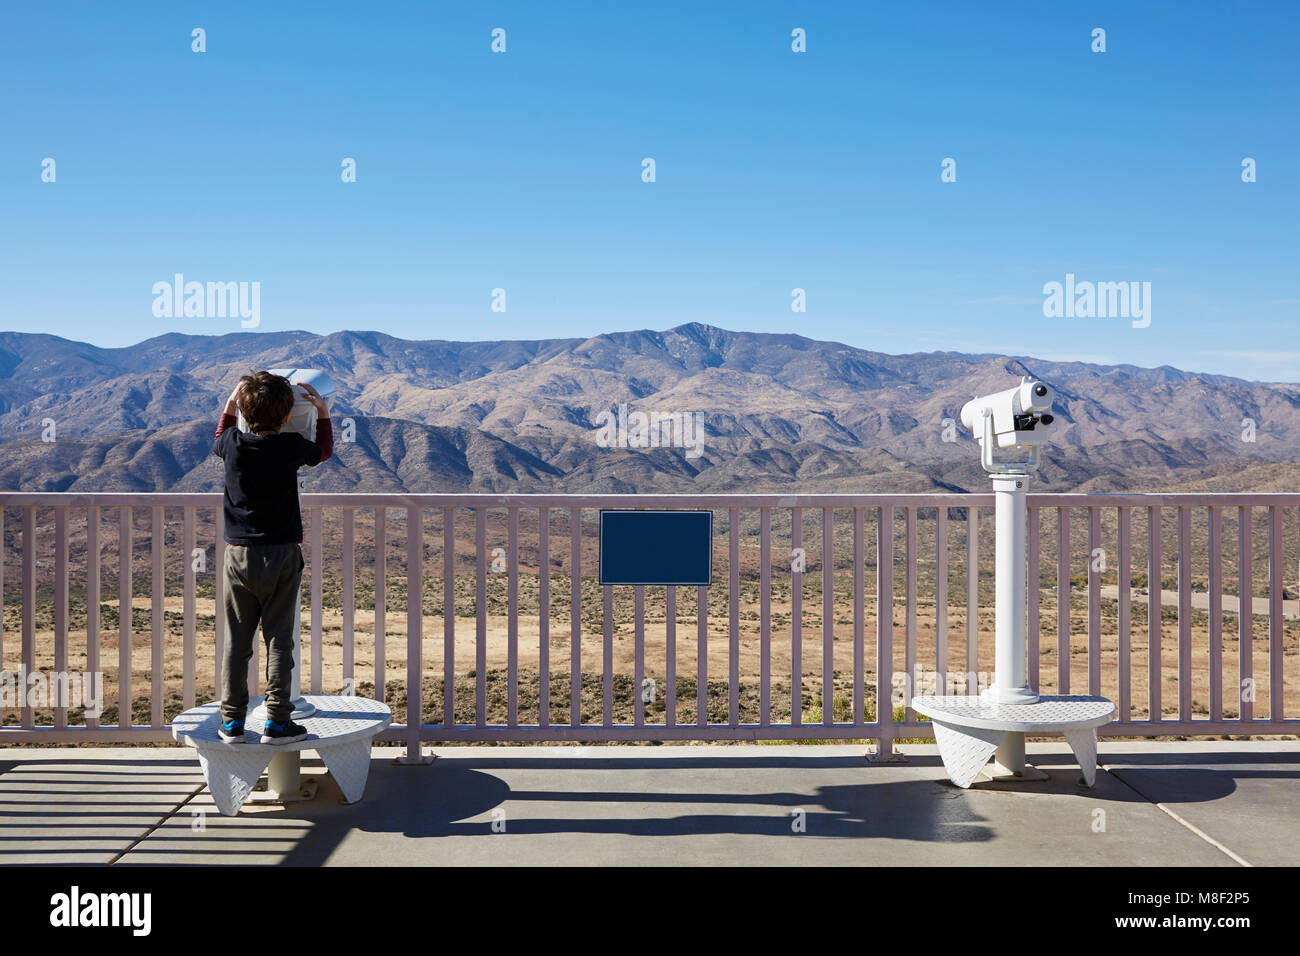 USA, Arizona, Boy (6-7) looking through coin operated binoculars - Stock Image